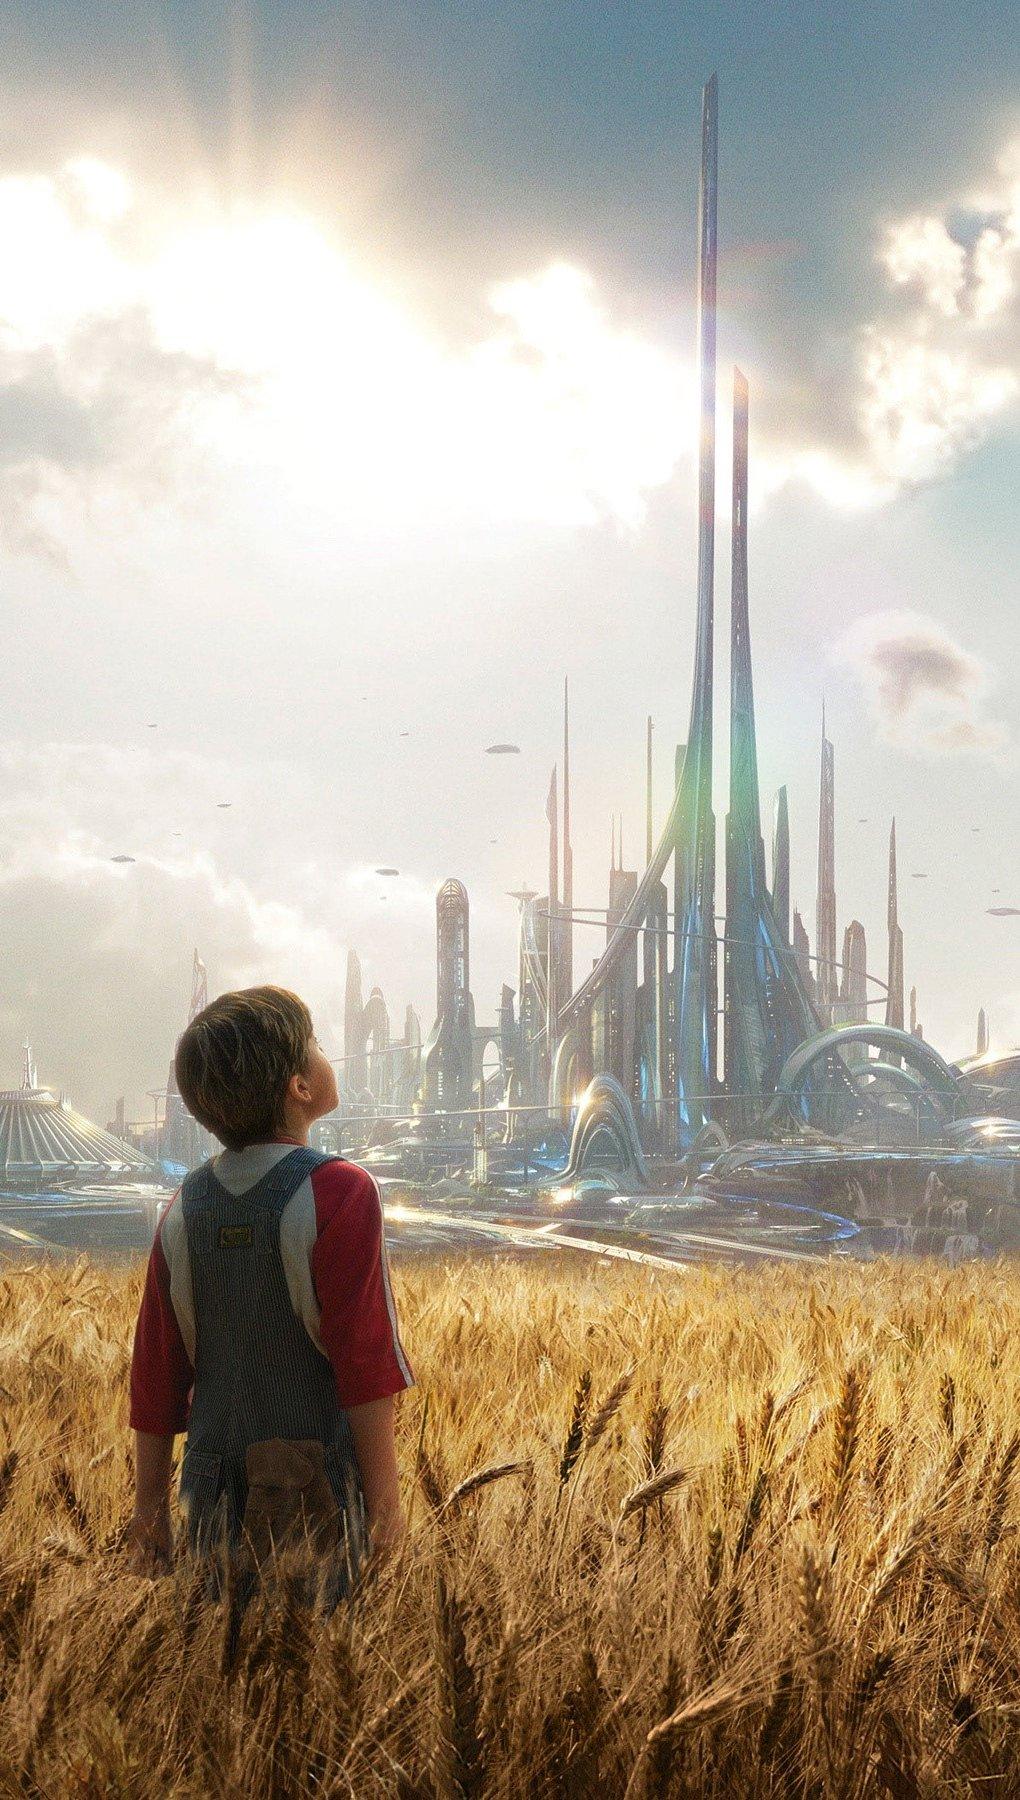 Fondos de pantalla Película El mundo del mañana Vertical